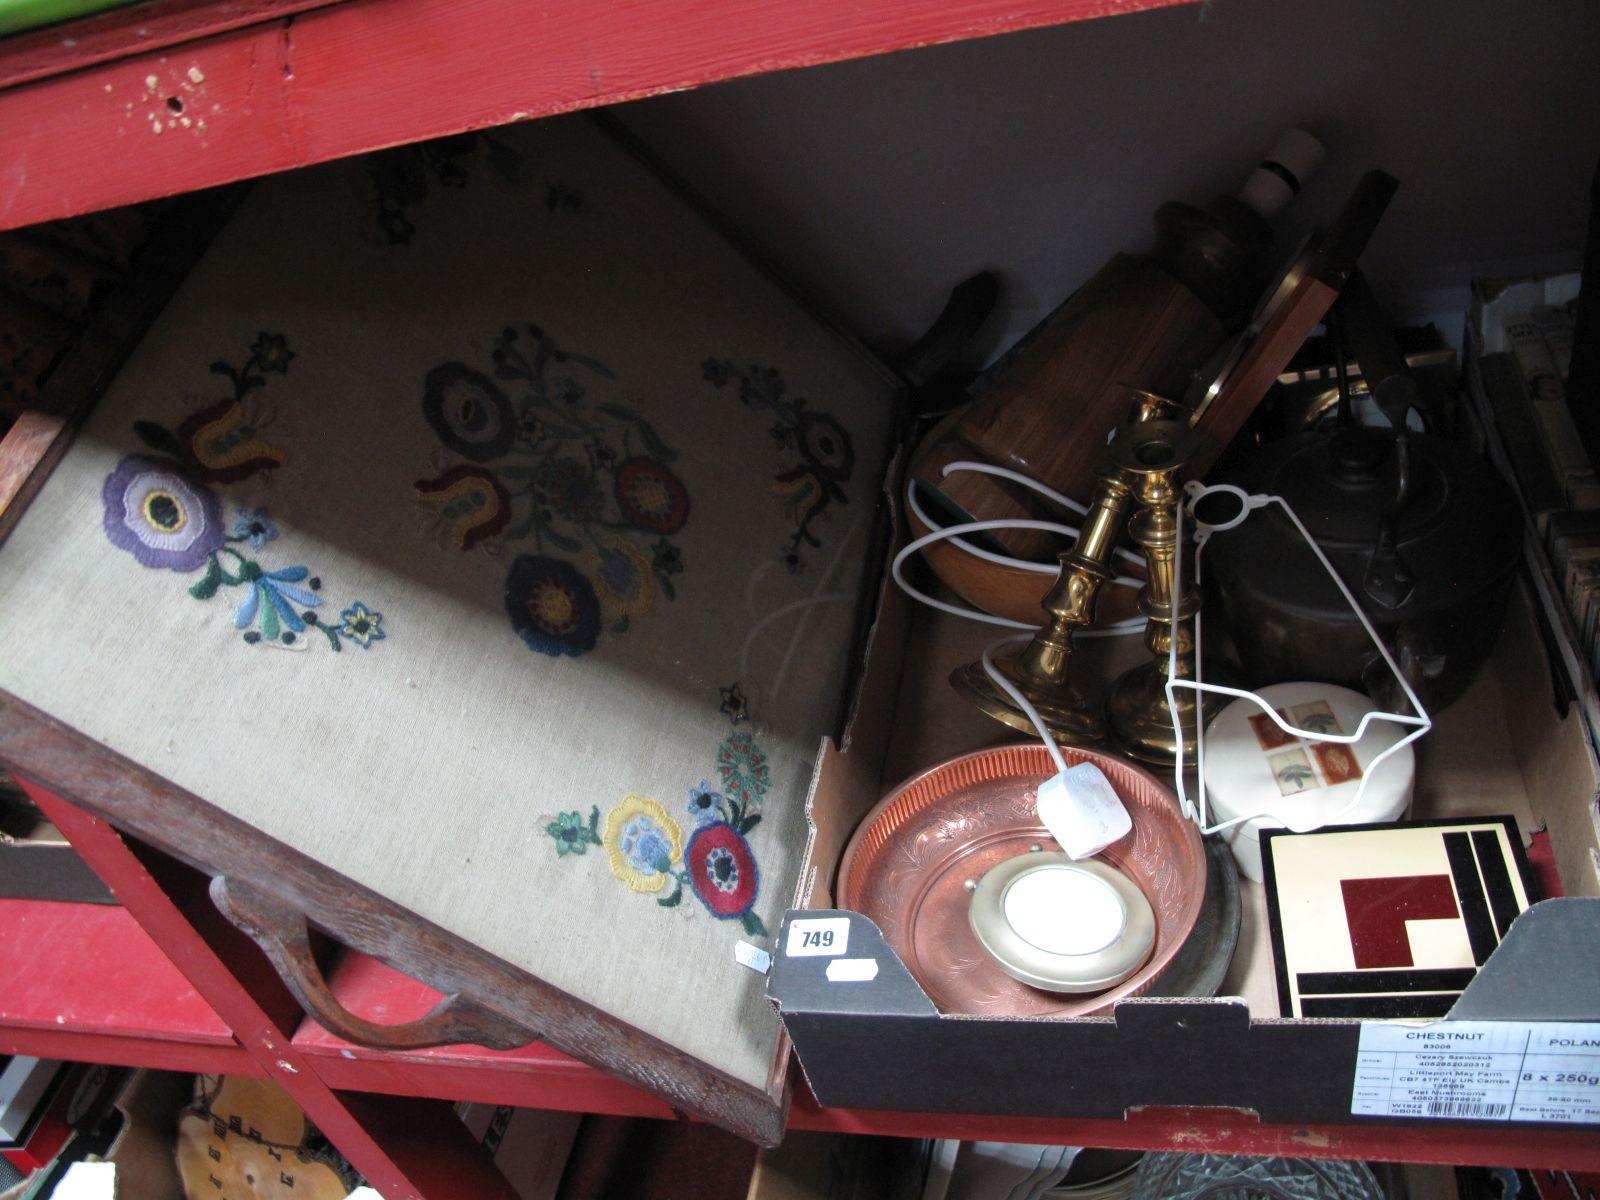 Lot 749 - A XIX Century Copper Kettle, brass candlesticks, etc:- One Box - a Hugo O'Carroll copper plaque,